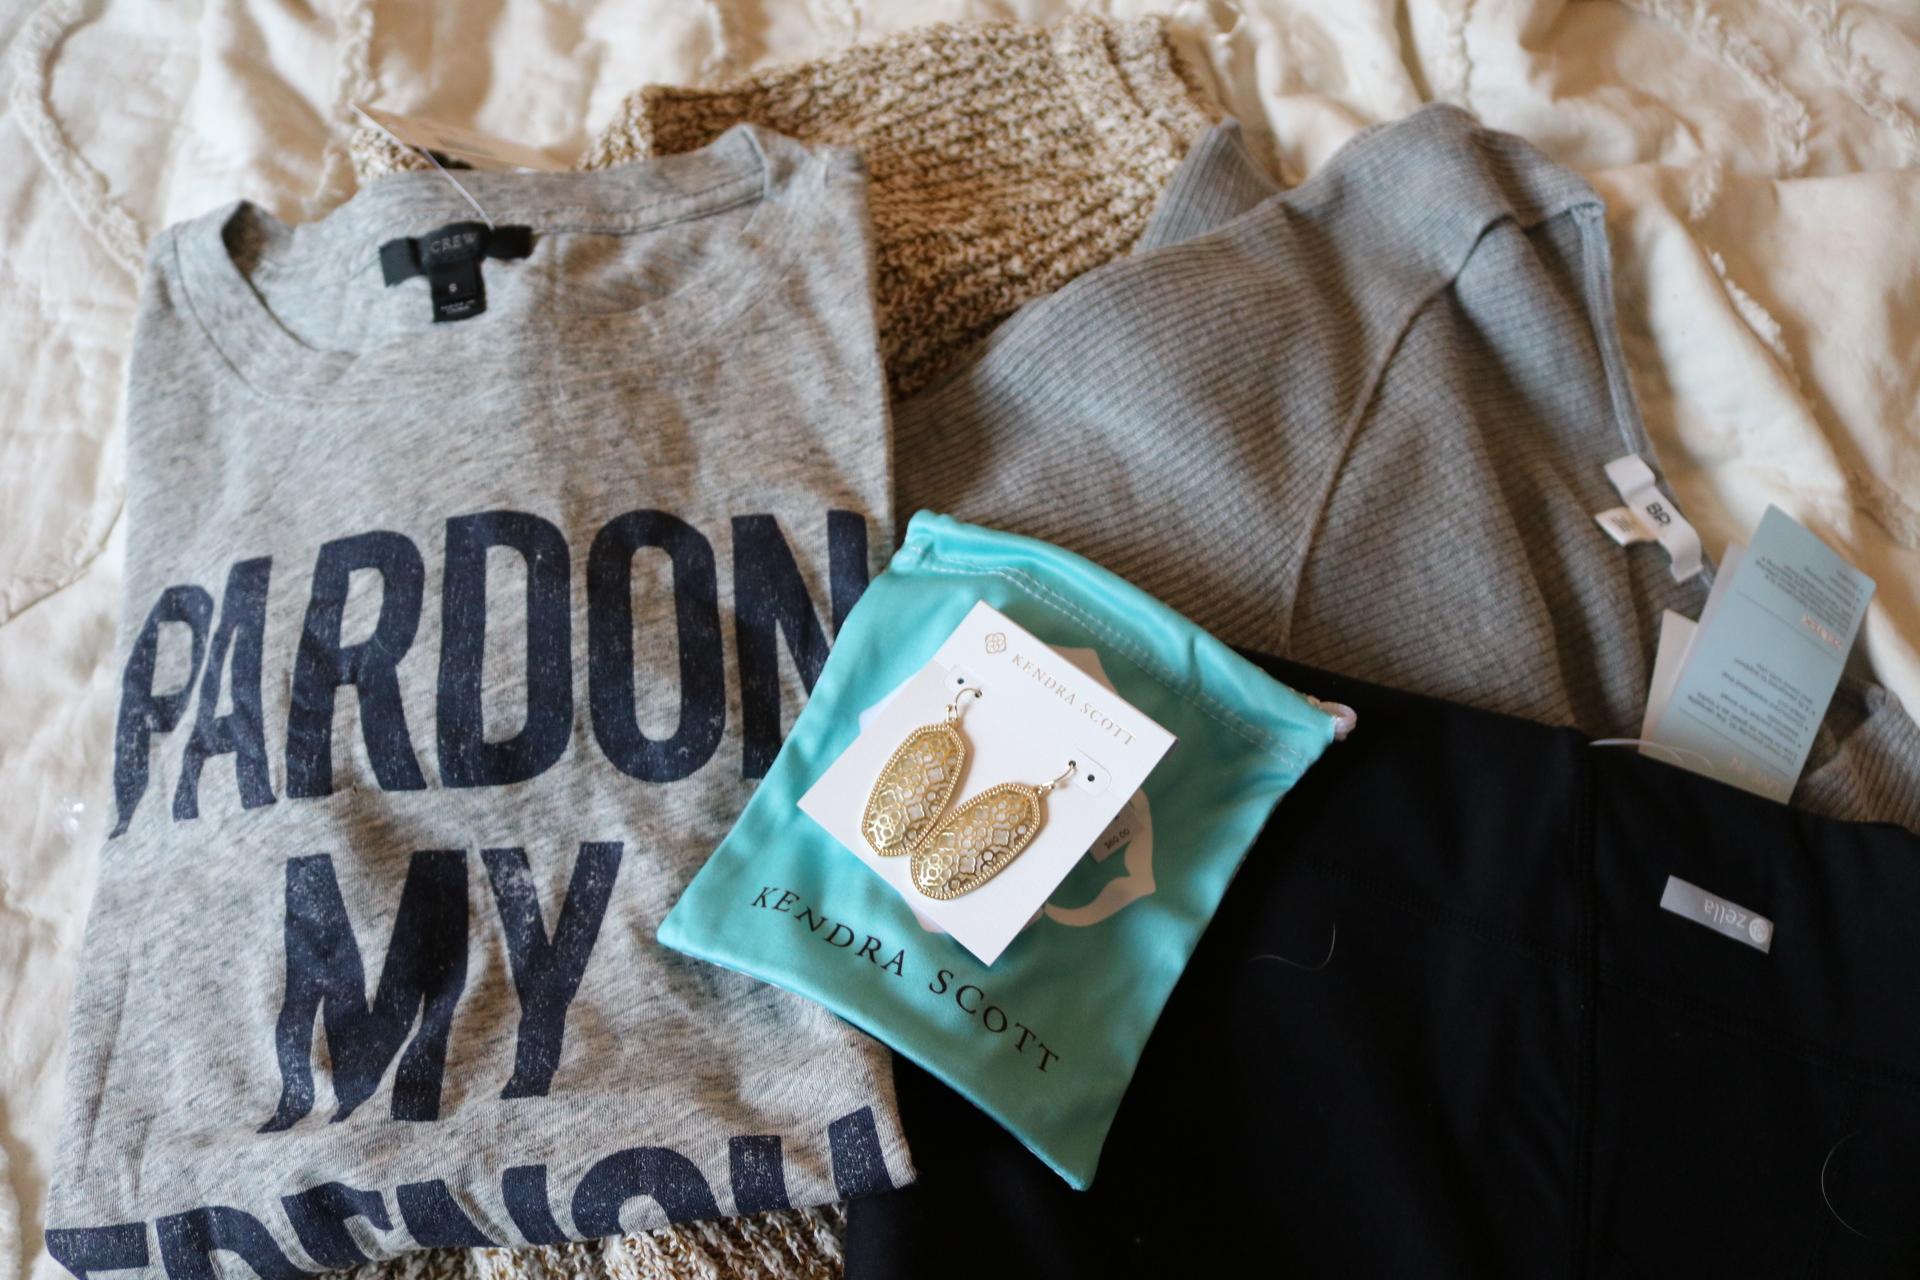 j crew graphic t-shirt, pardon my french shirt, zella live in leggings, free people sweater, kendra scott earrings